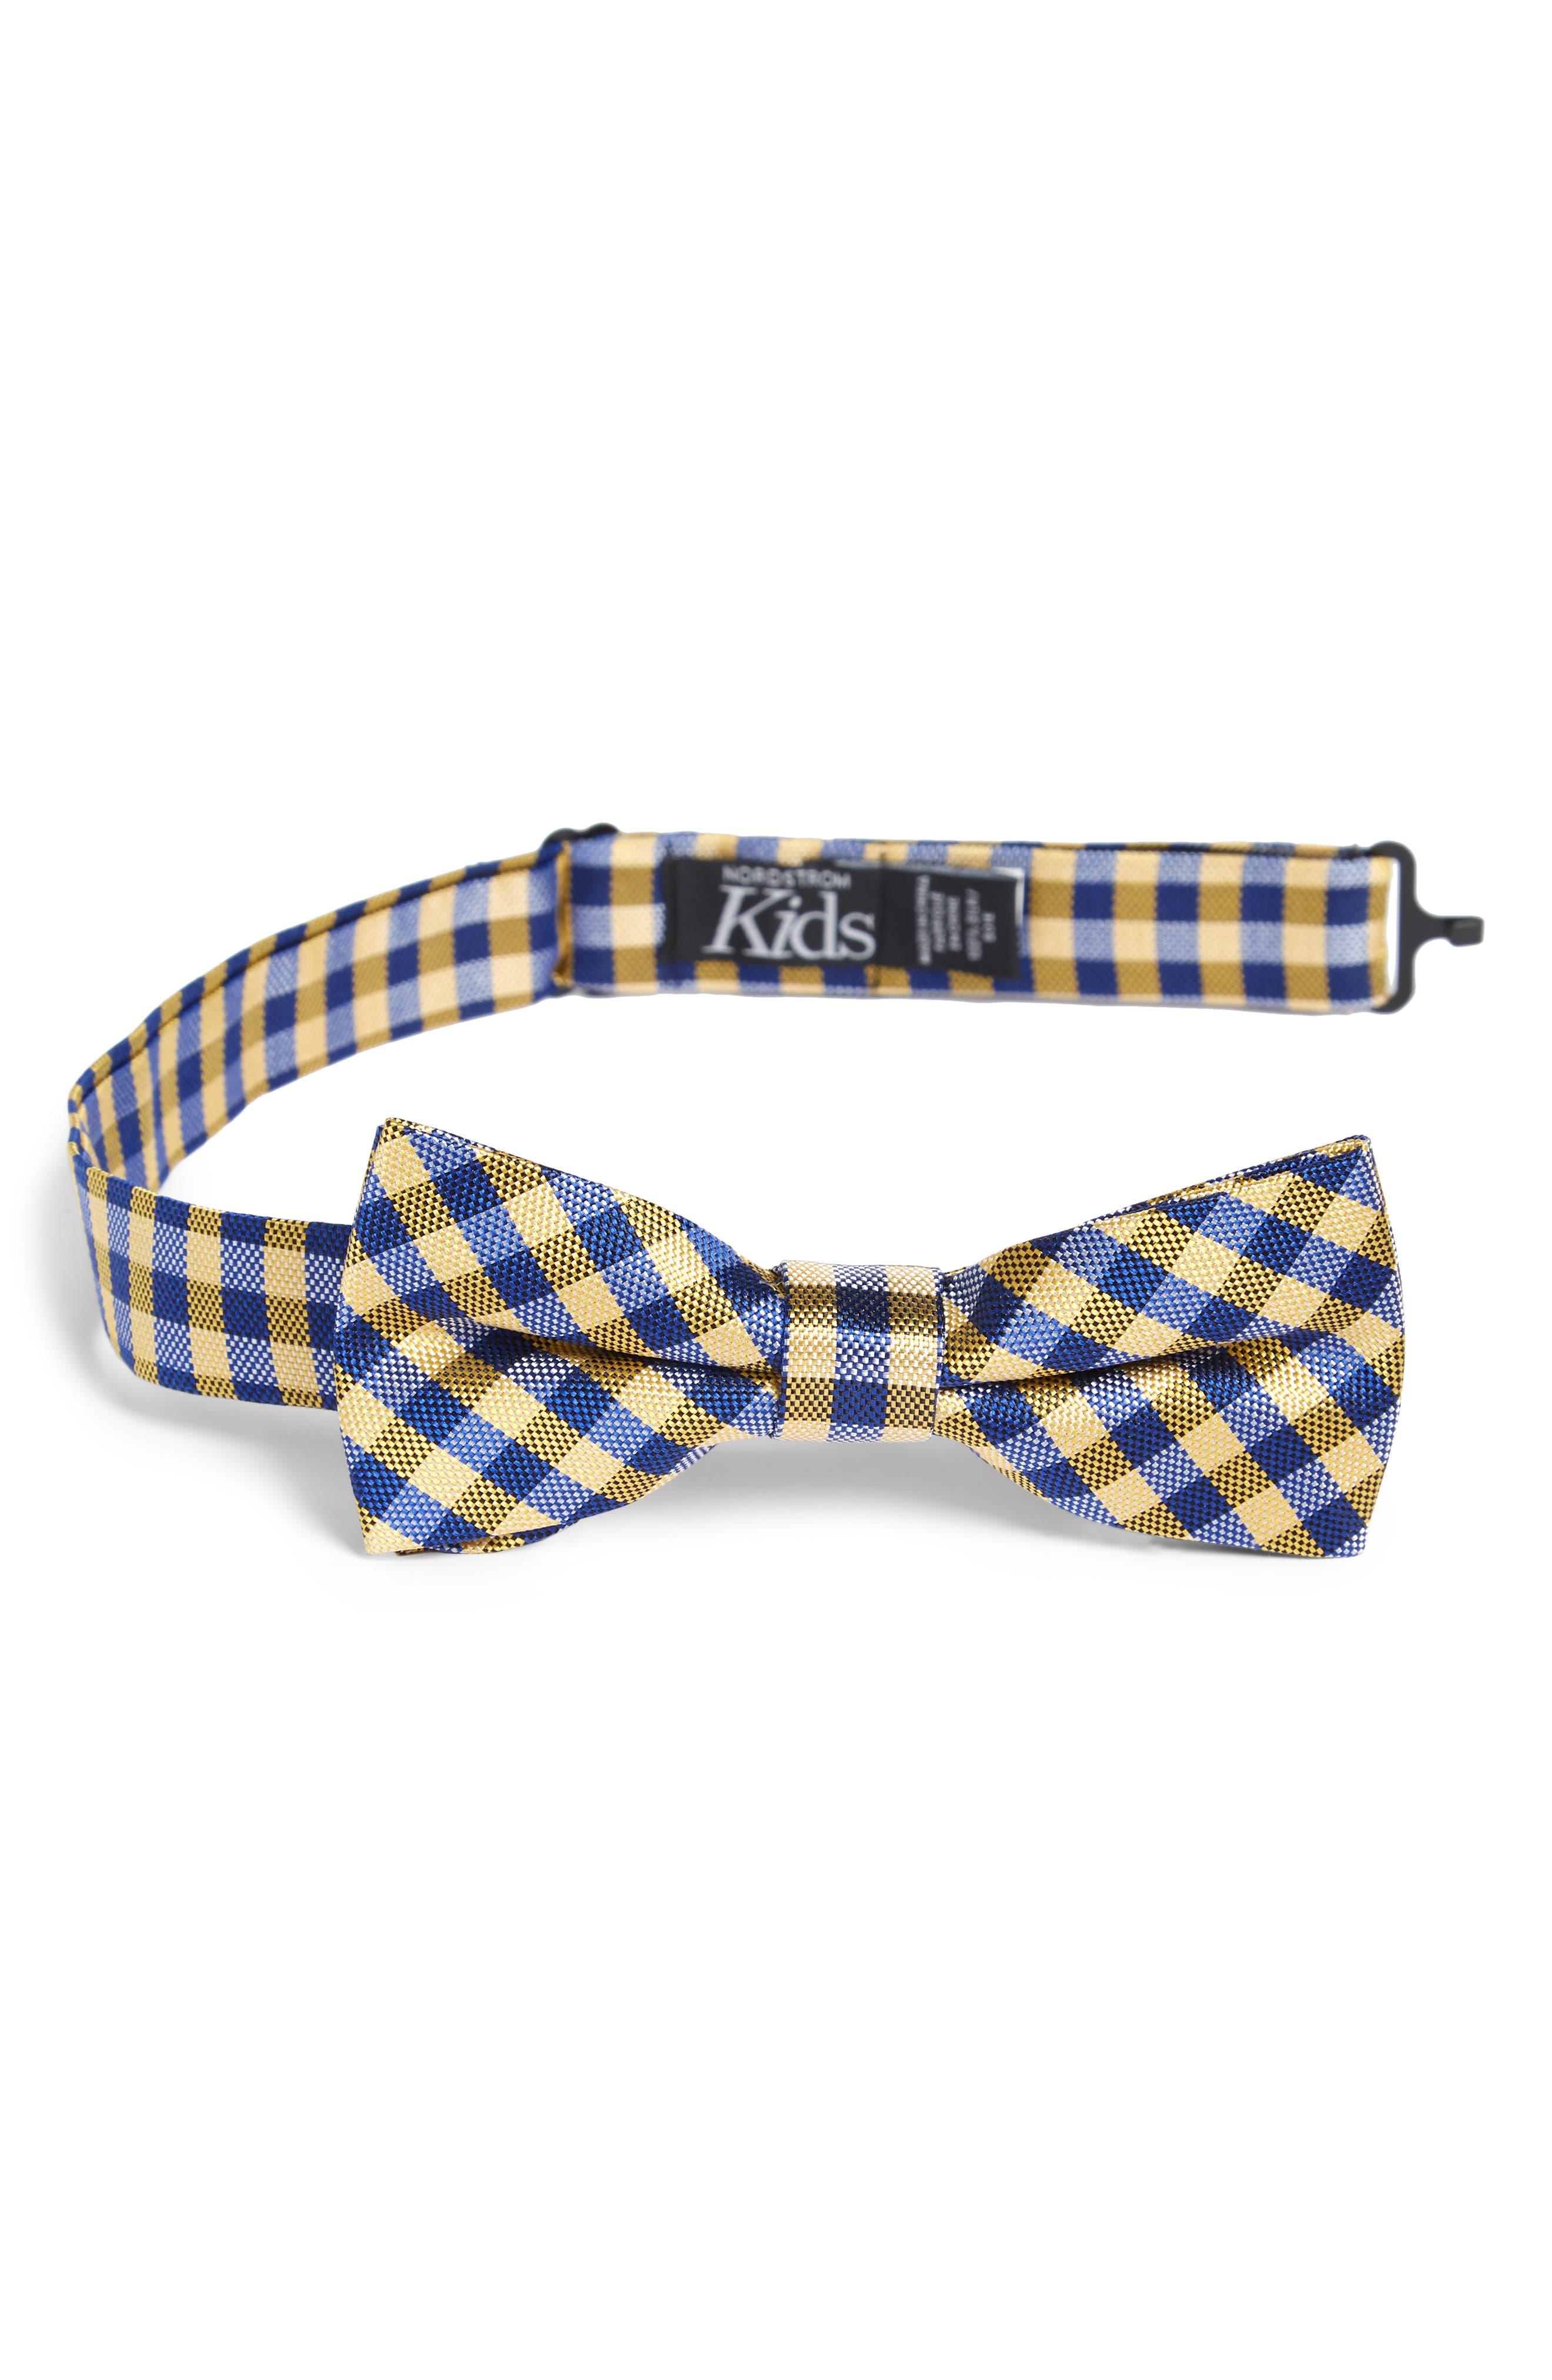 NORDSTROM, Plaid Silk Bow Tie, Main thumbnail 1, color, 700